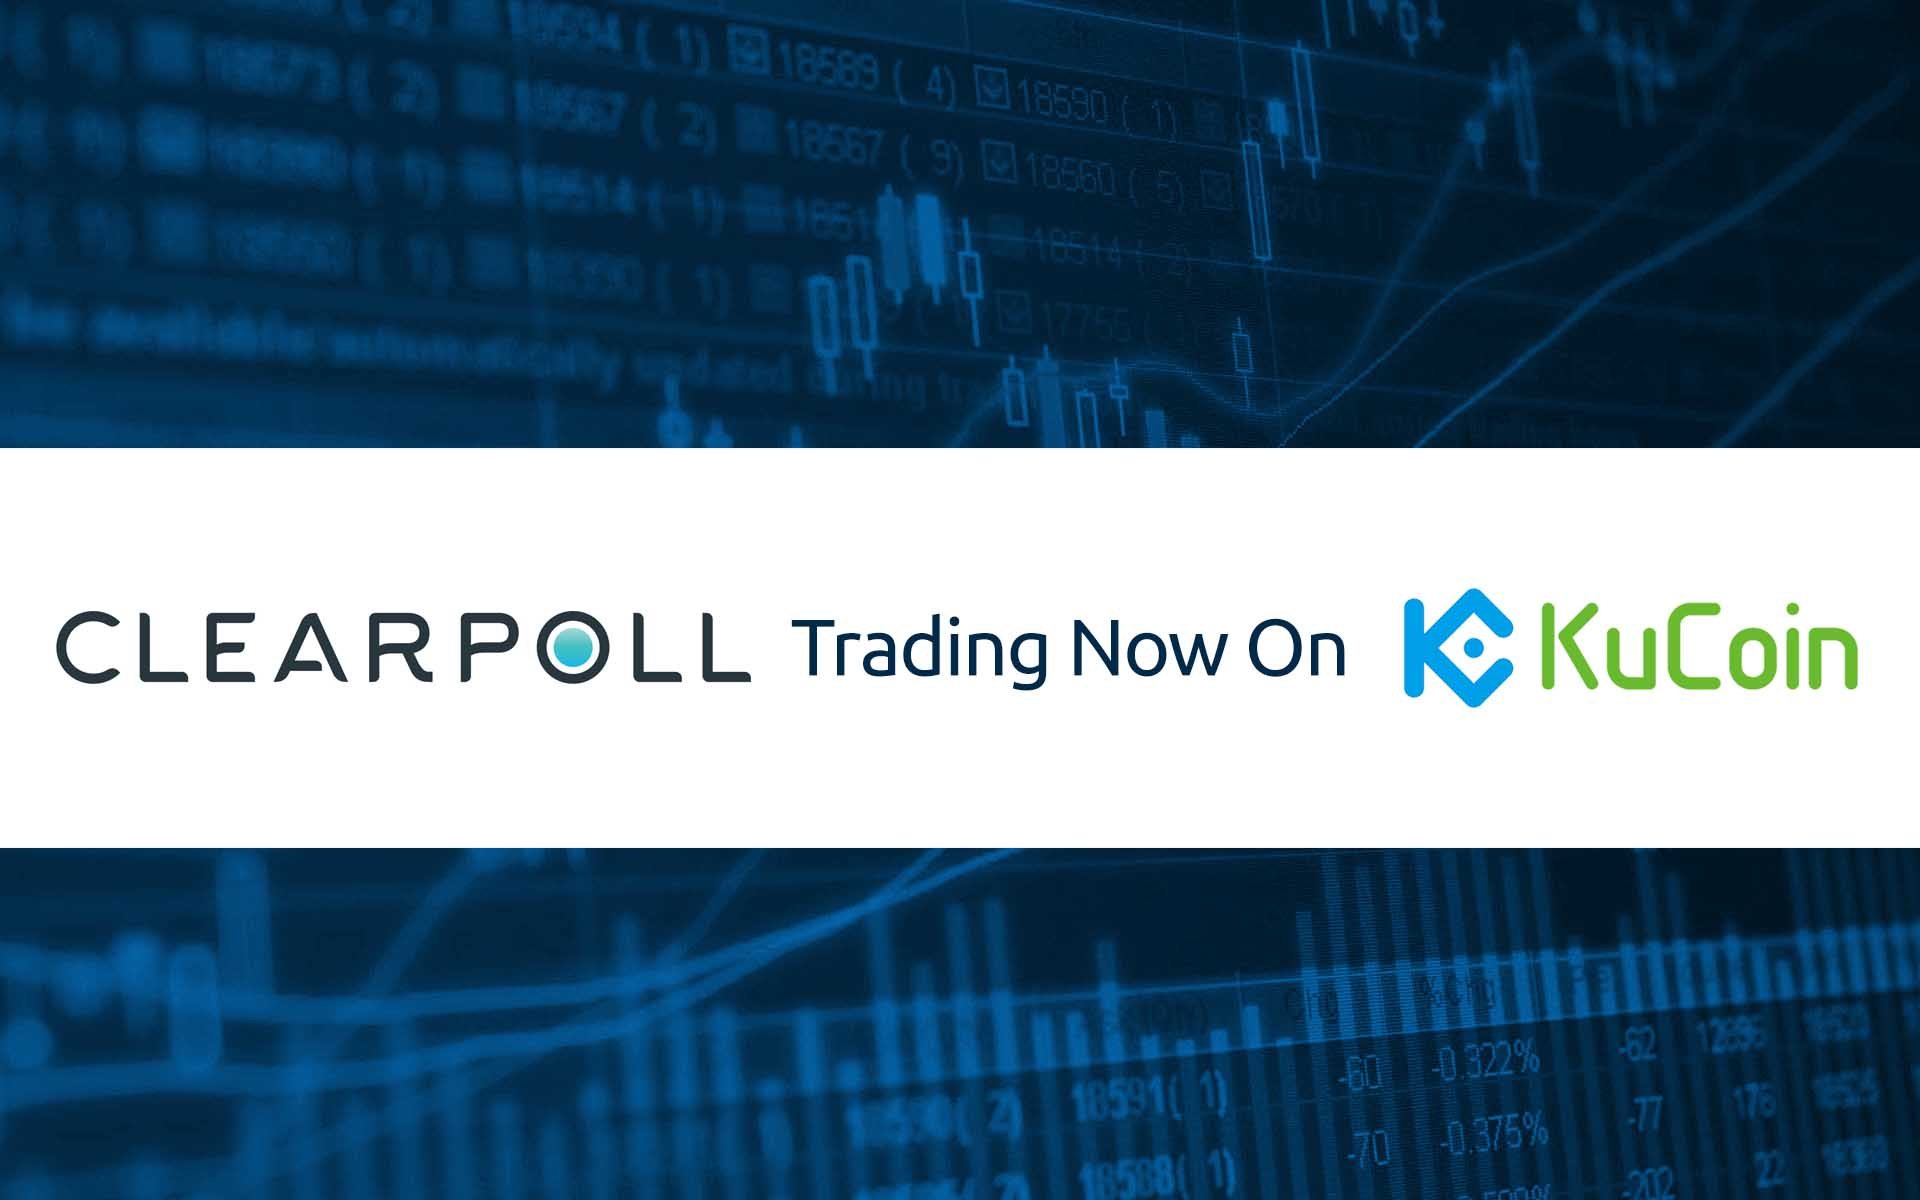 ClearPoll Now Listed On KuCoin - POLL/BTC and POLL/ETC